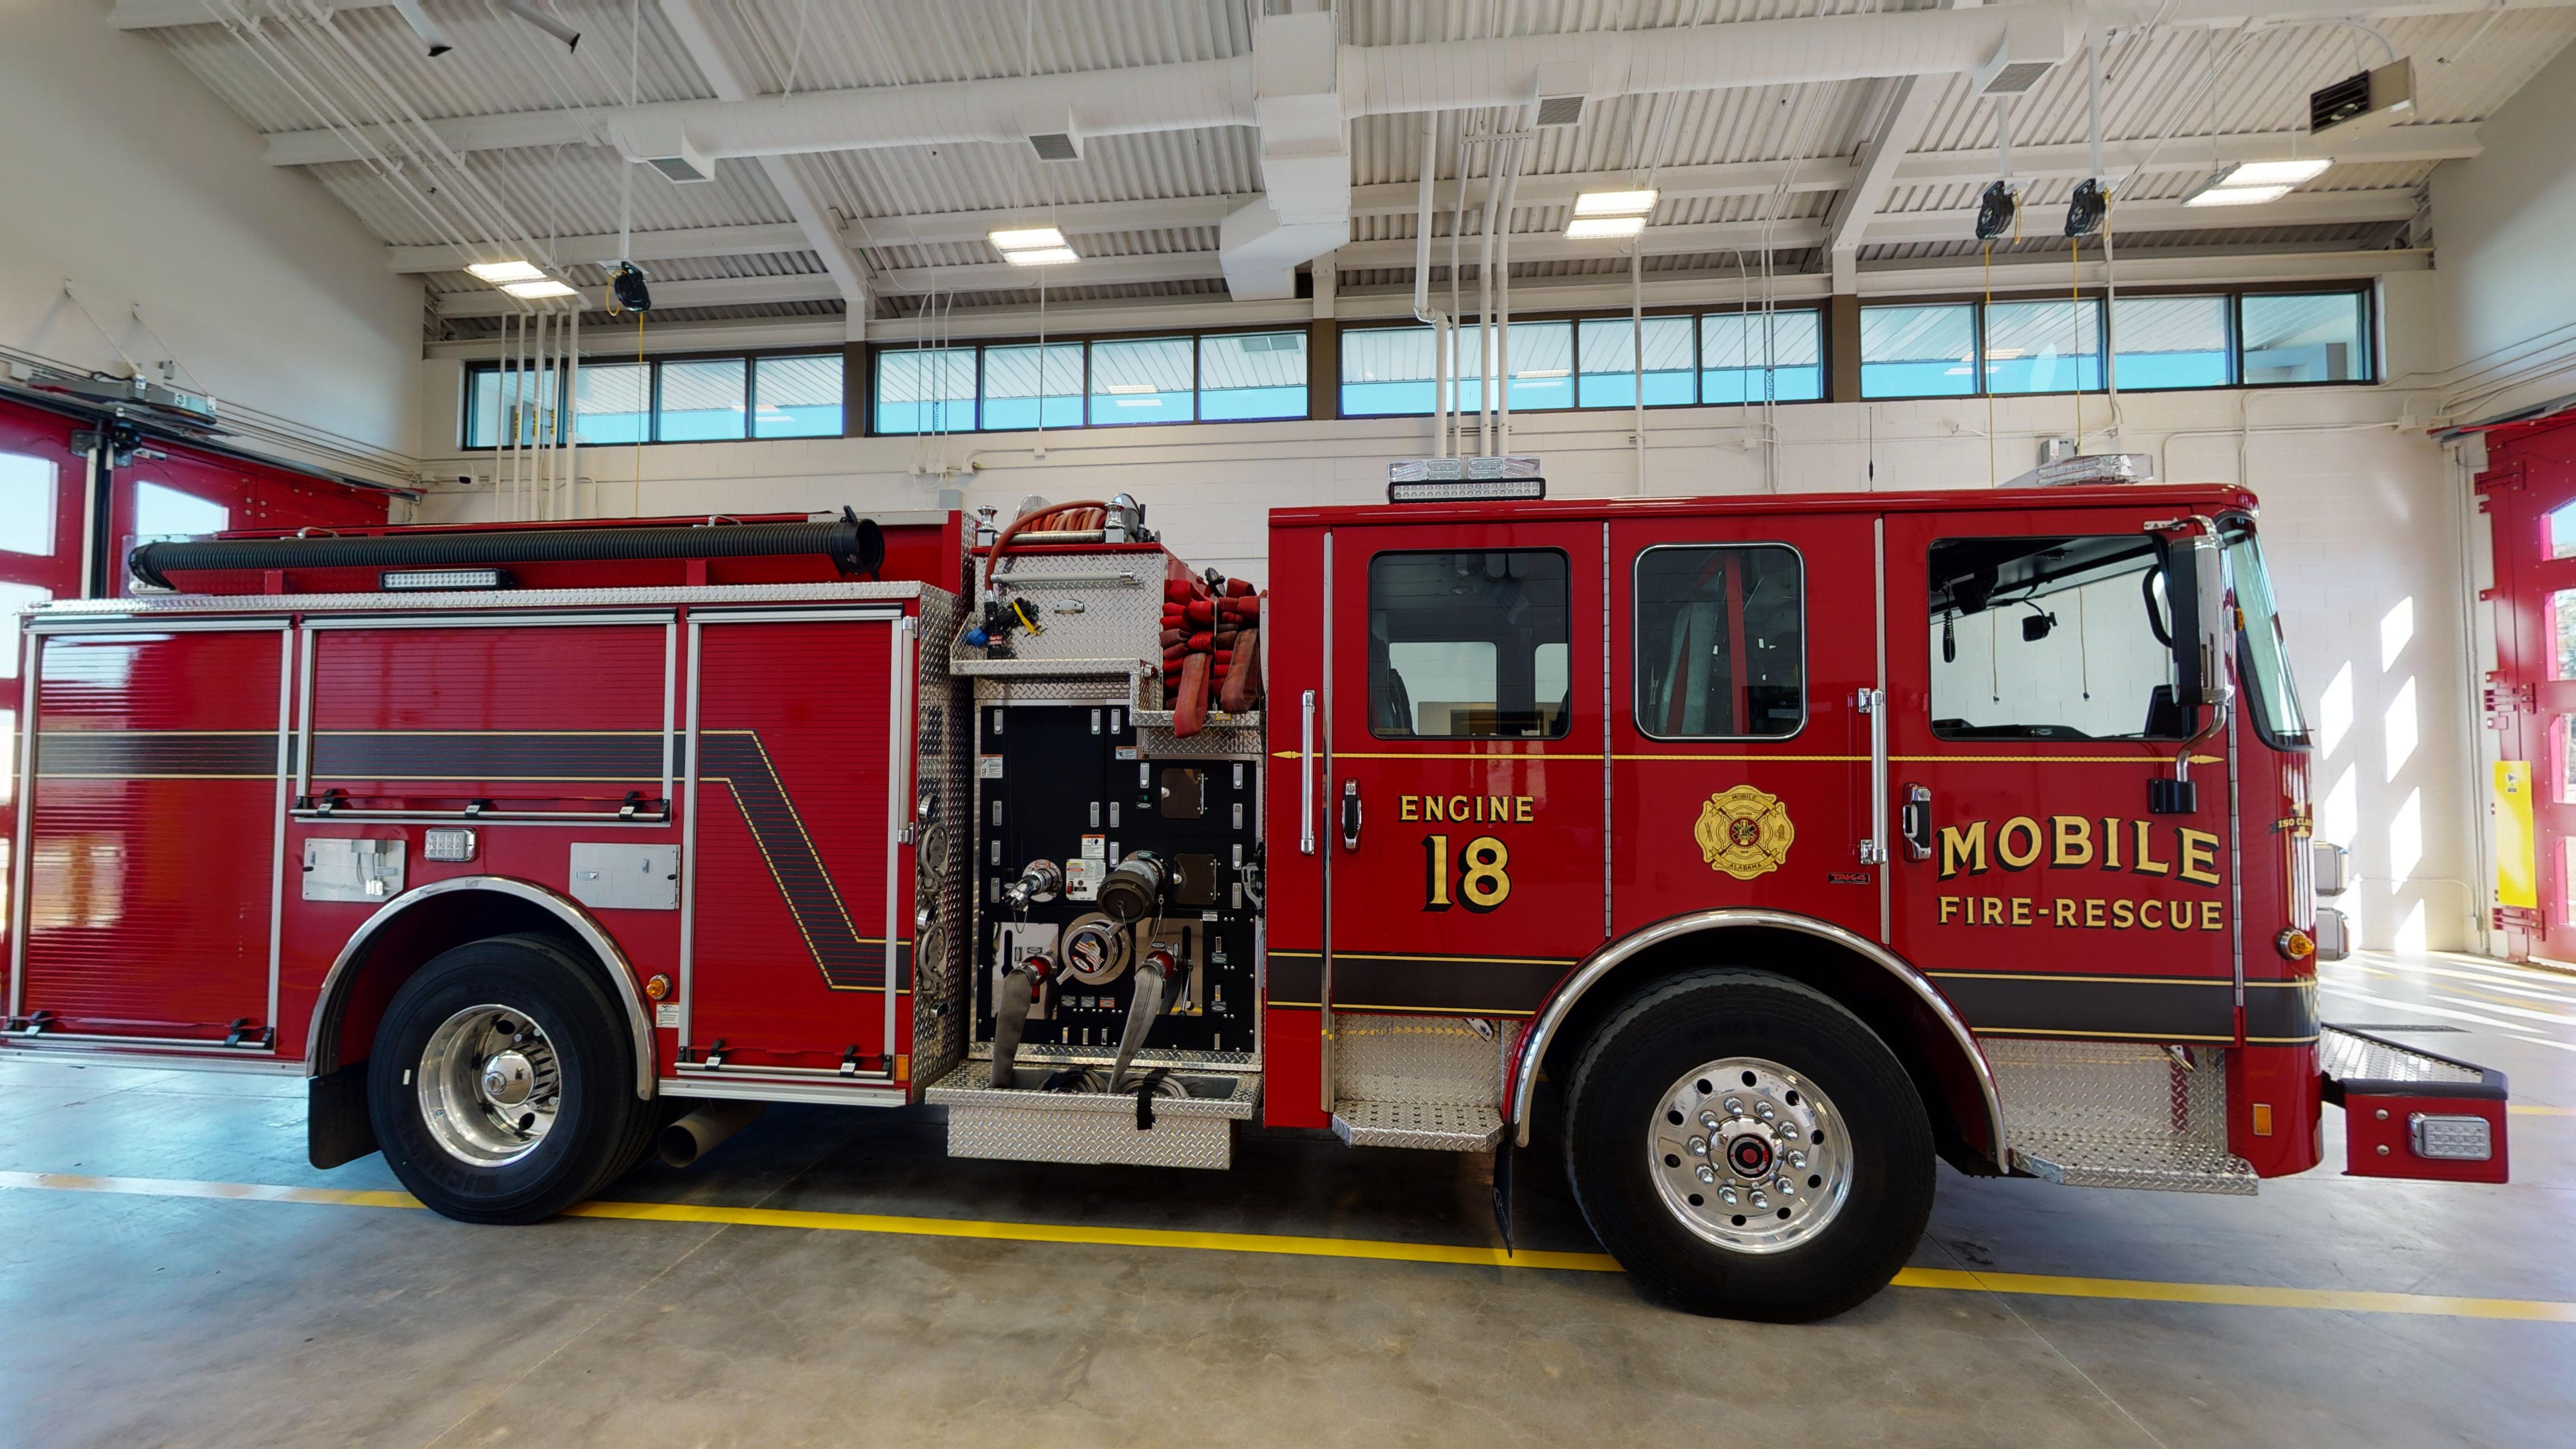 Mobile-Fire-Rescue-Engine-18-06182021_141012